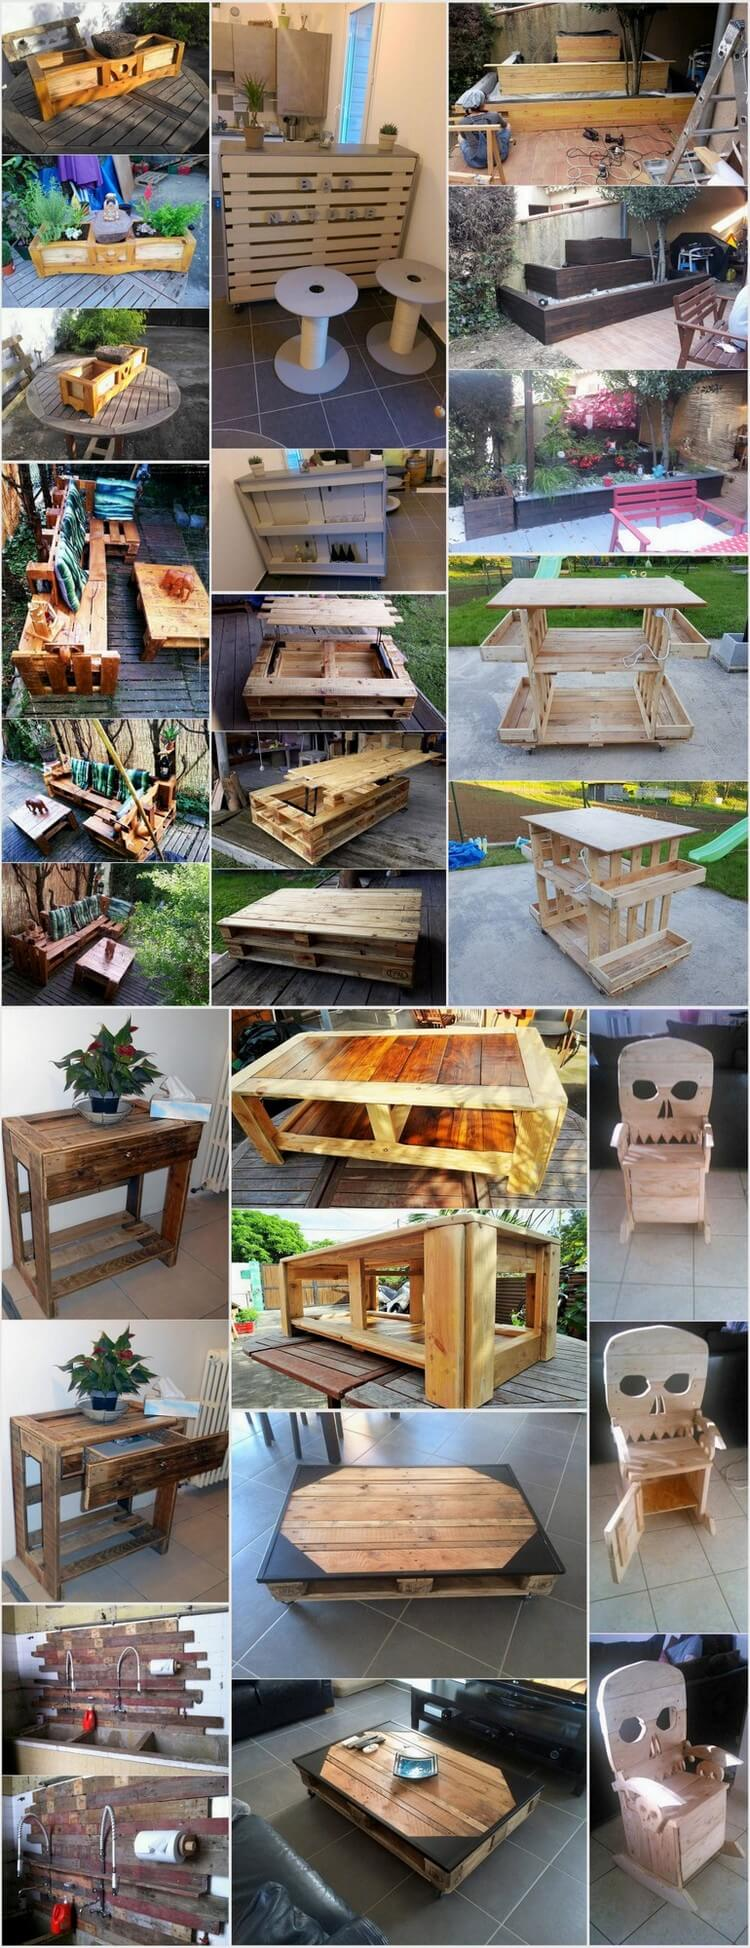 Superb Reusing Ideas for Old Wooden Pallets